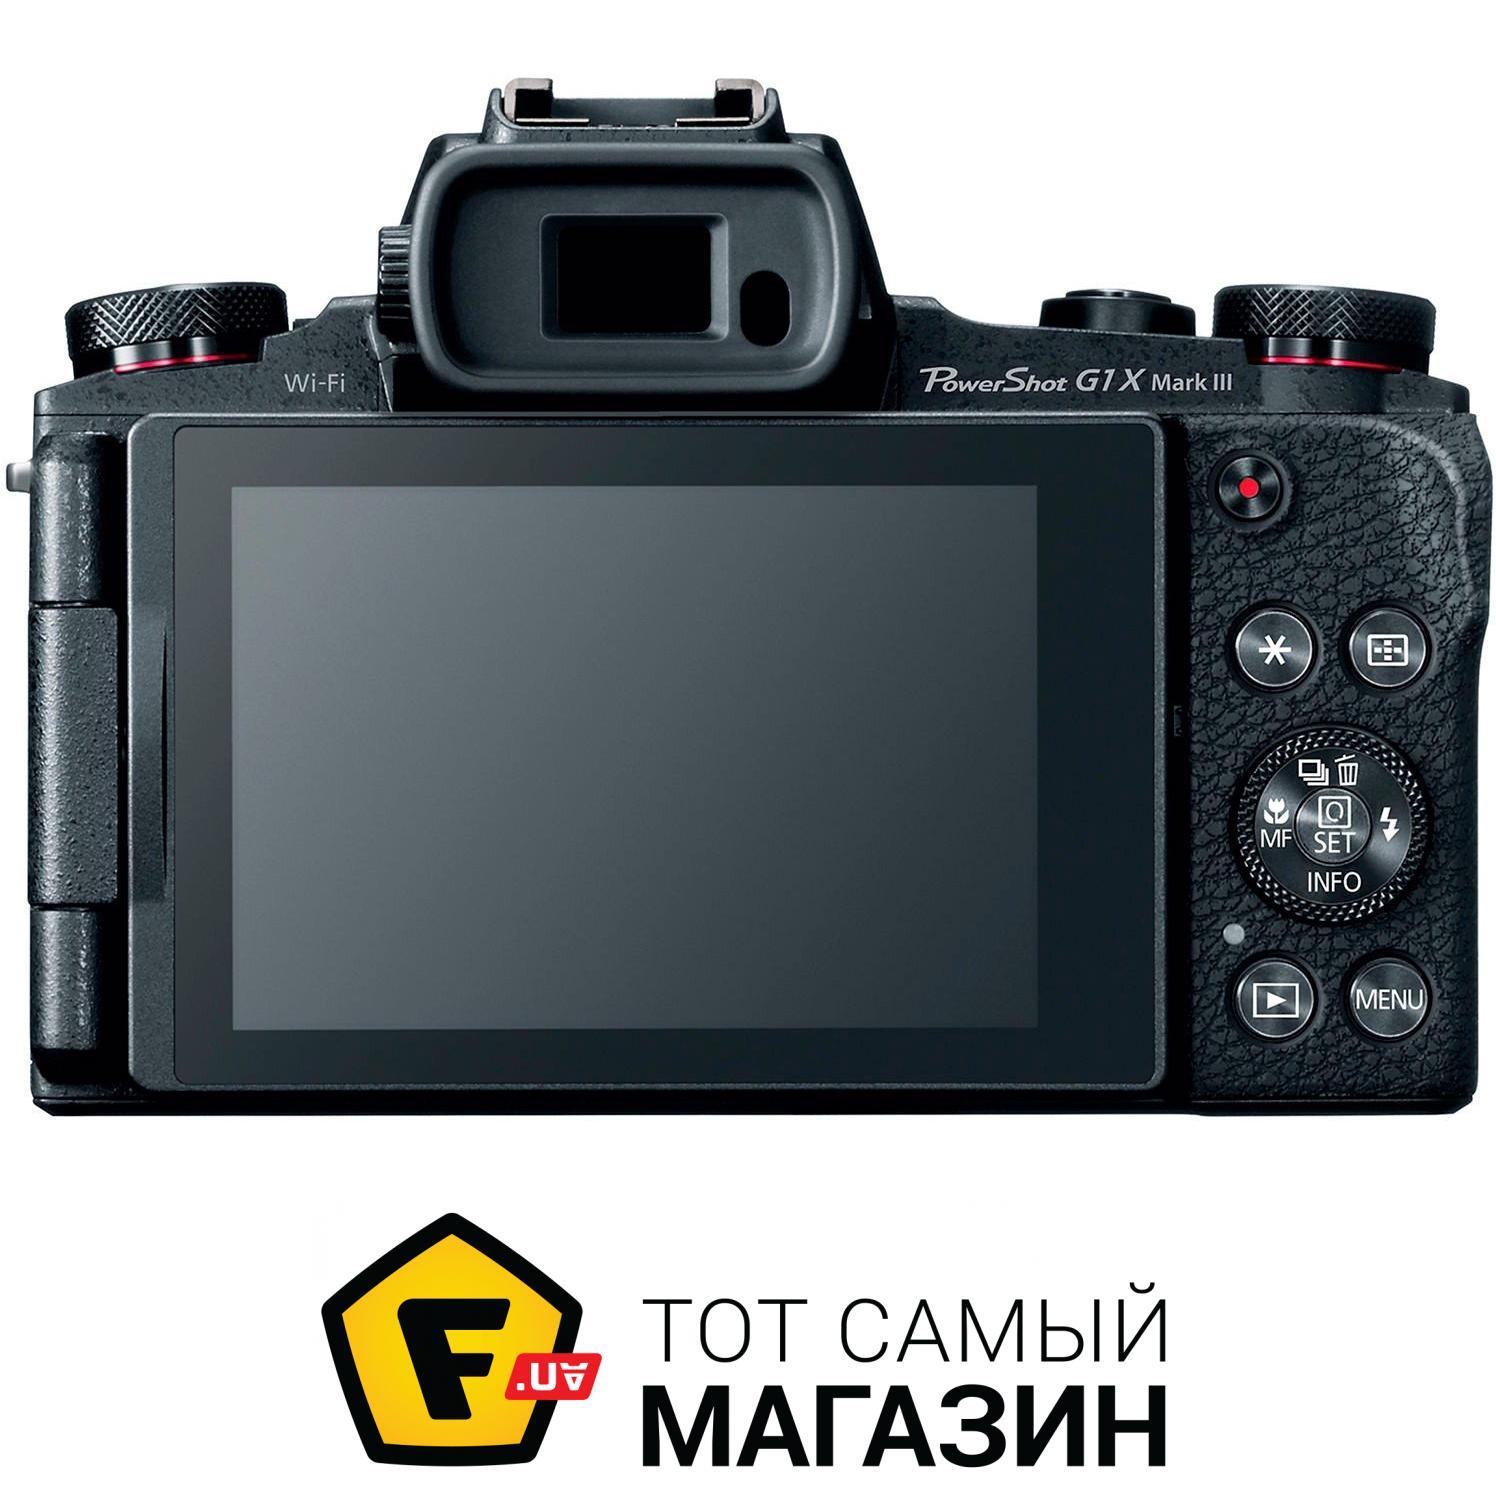 Где меню фотоаппарата тип матрицы